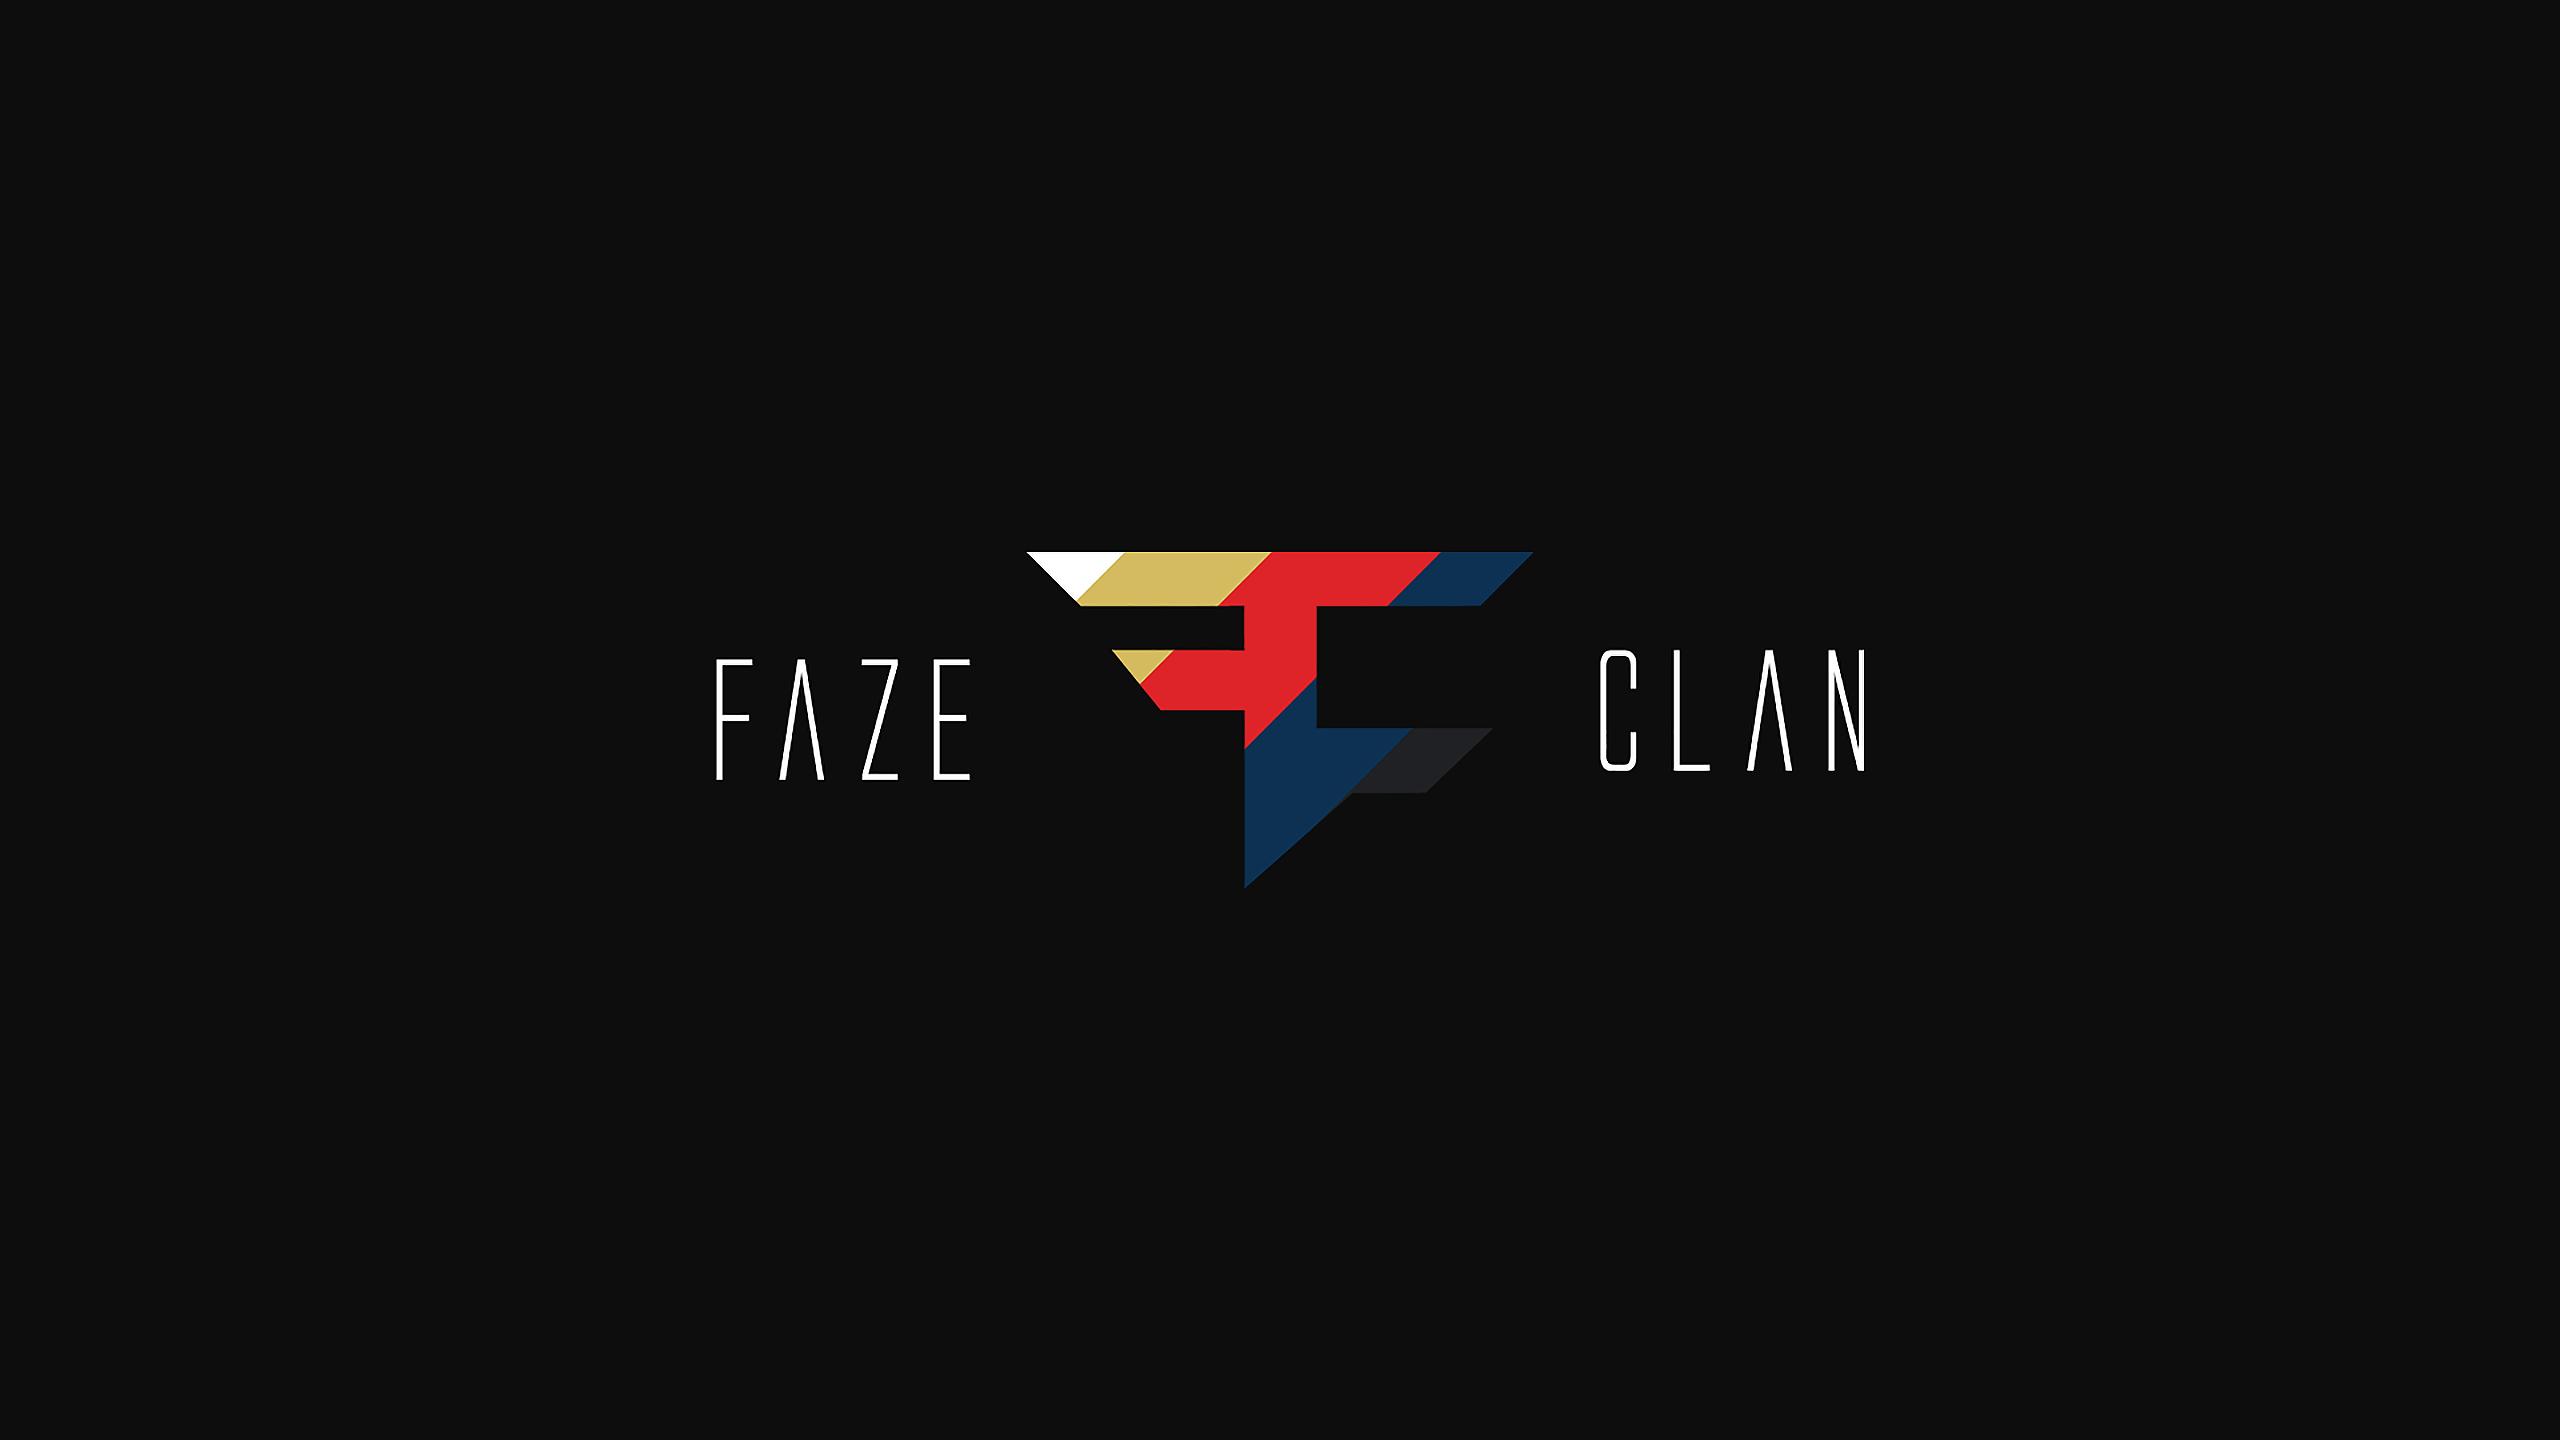 FaZe Clan Wallpapers - Wallpaper Cave